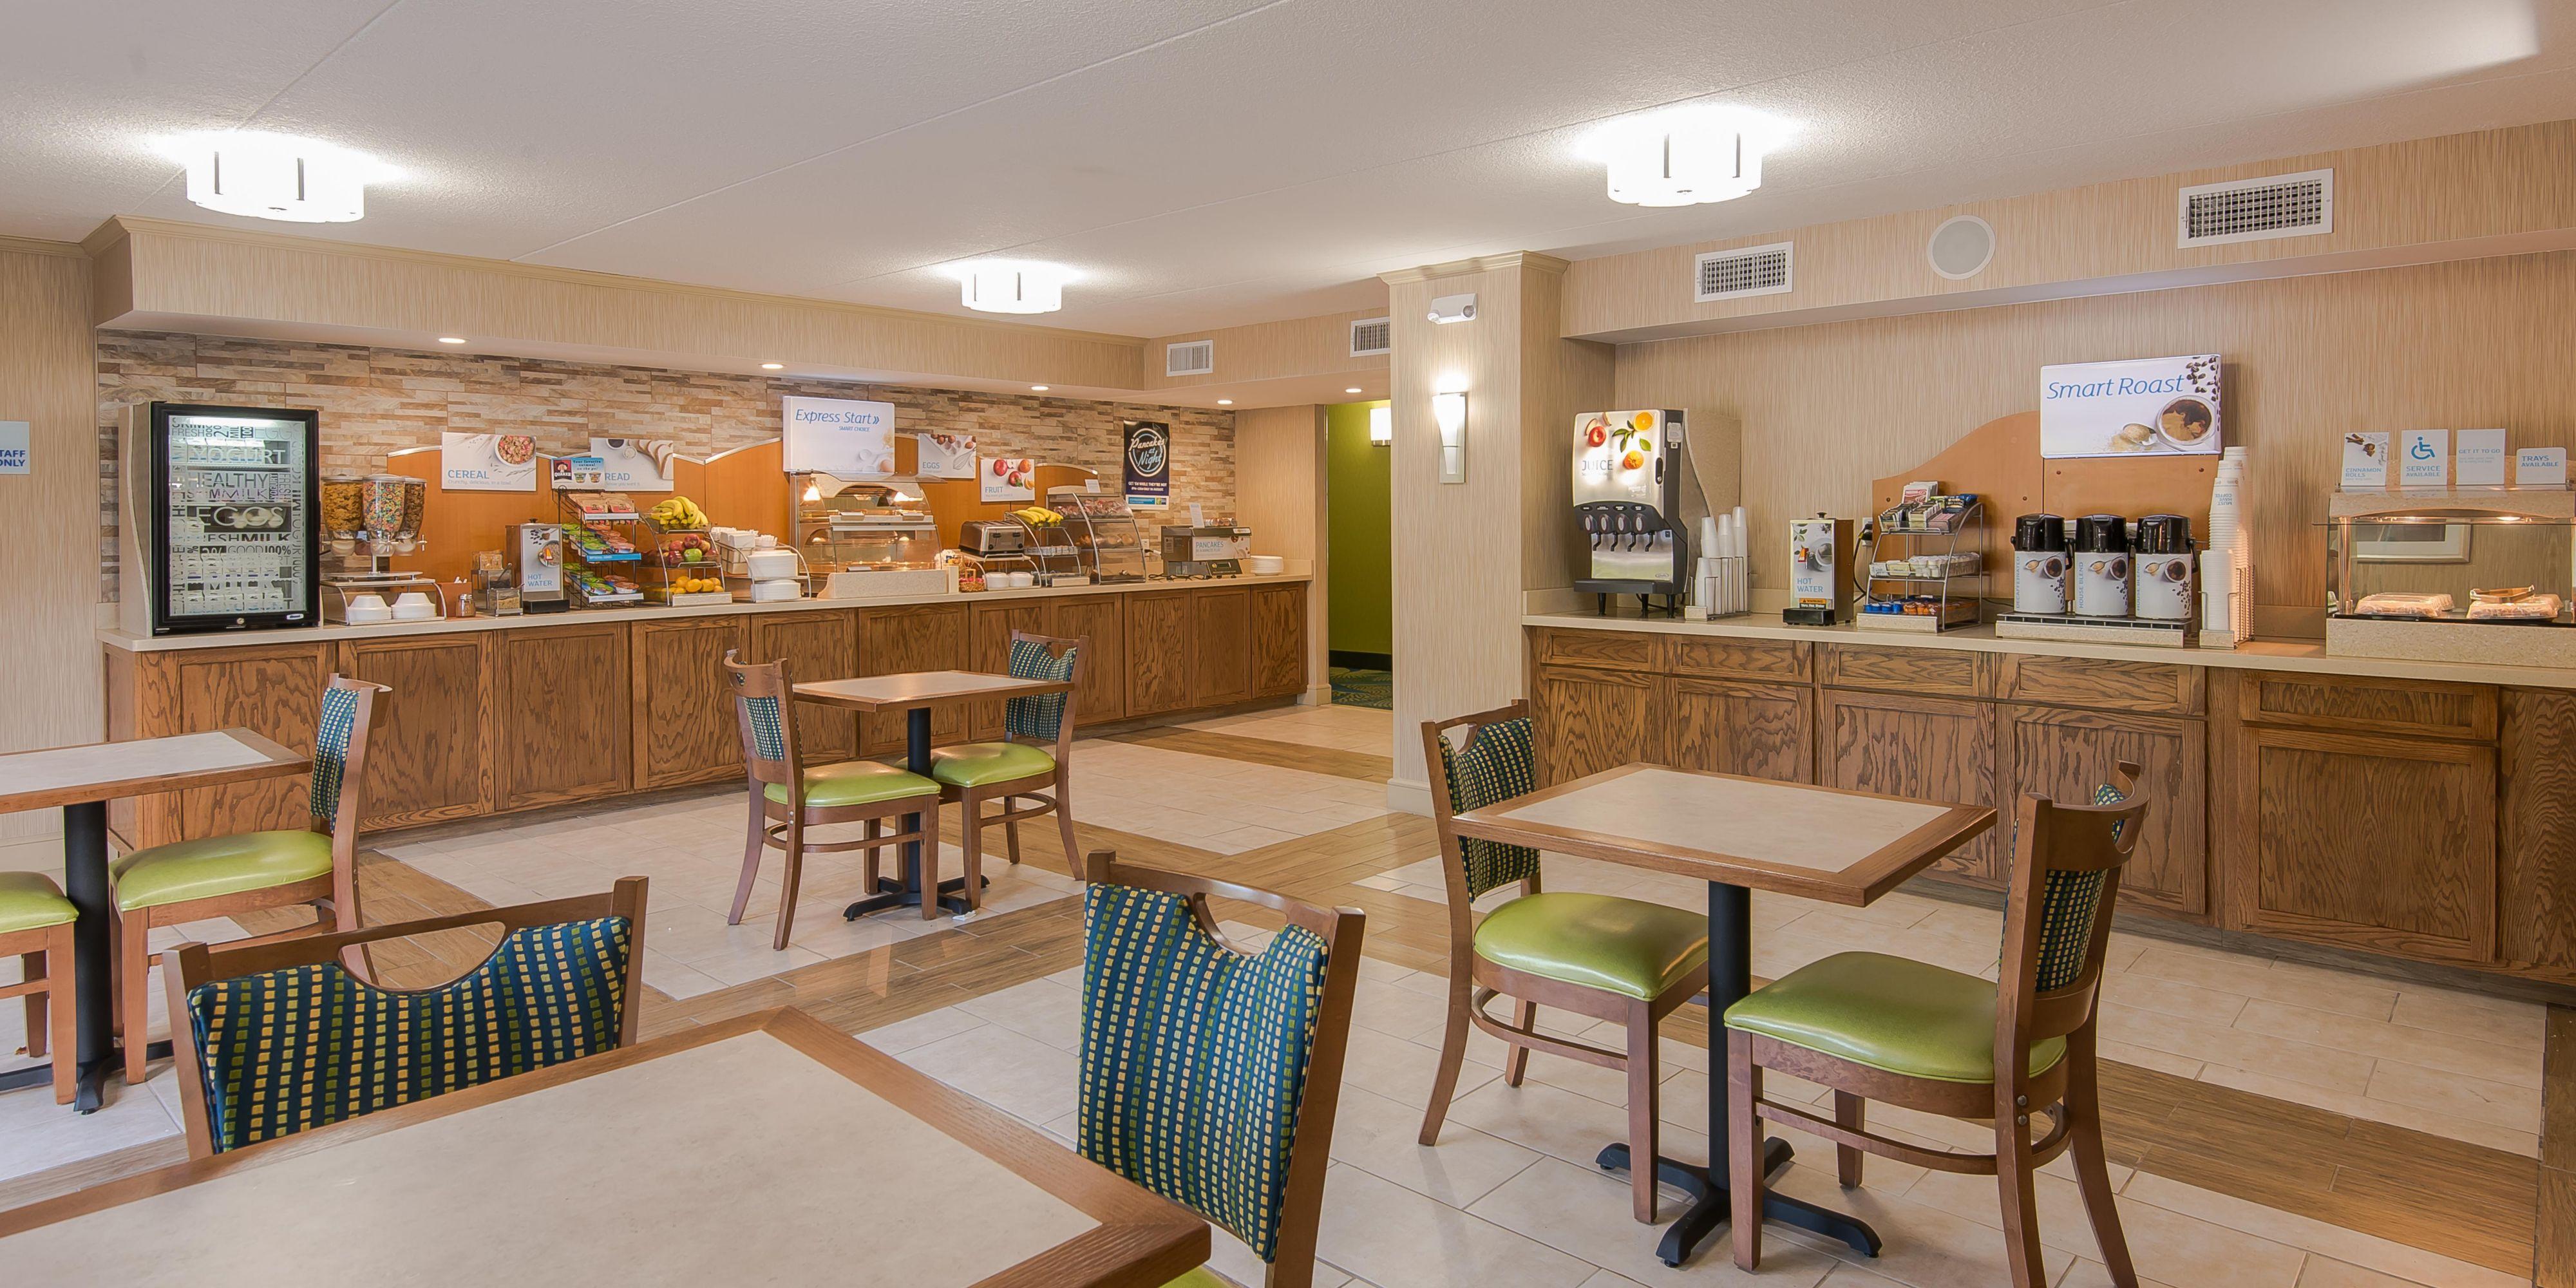 Holiday Inn Express Roanoke 4132270139 2x1